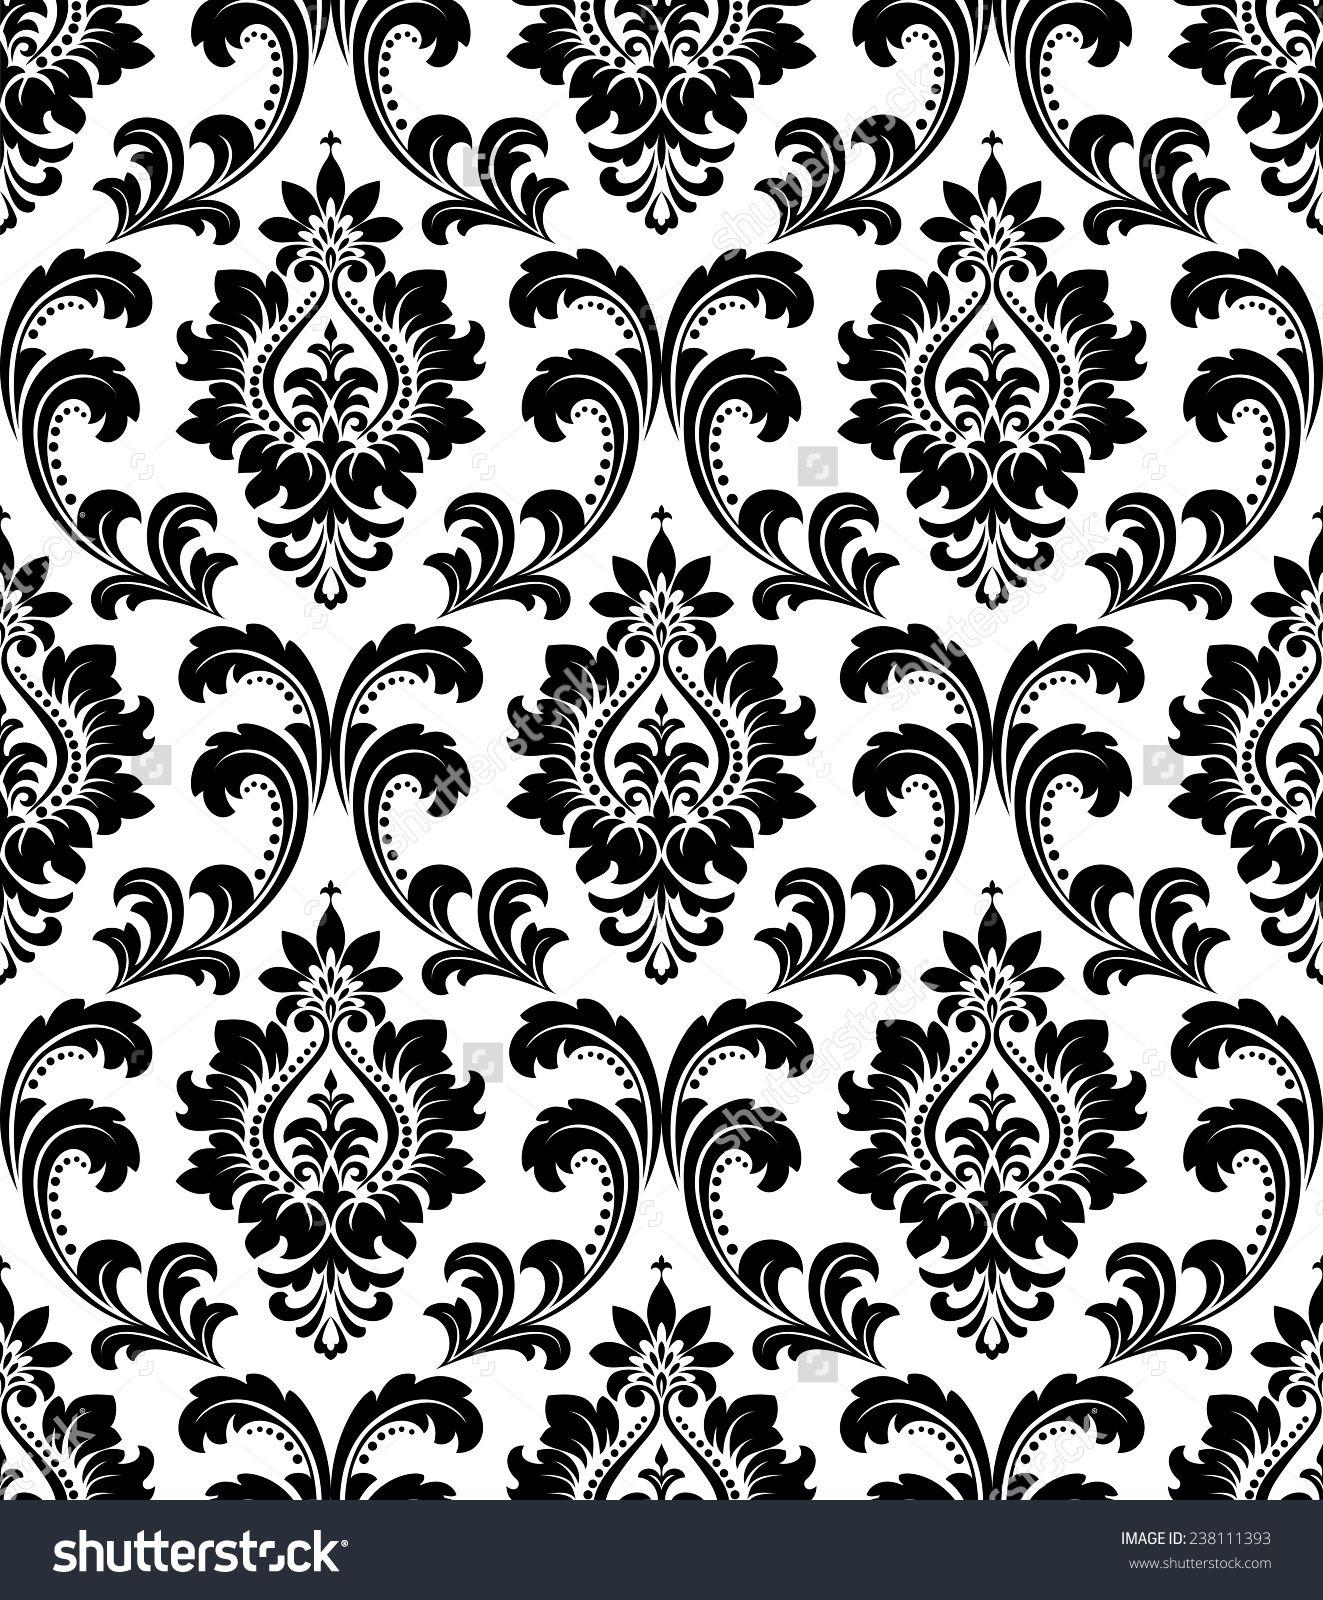 8 Best Images Of Black And White Floral Wallpaper Border Corner